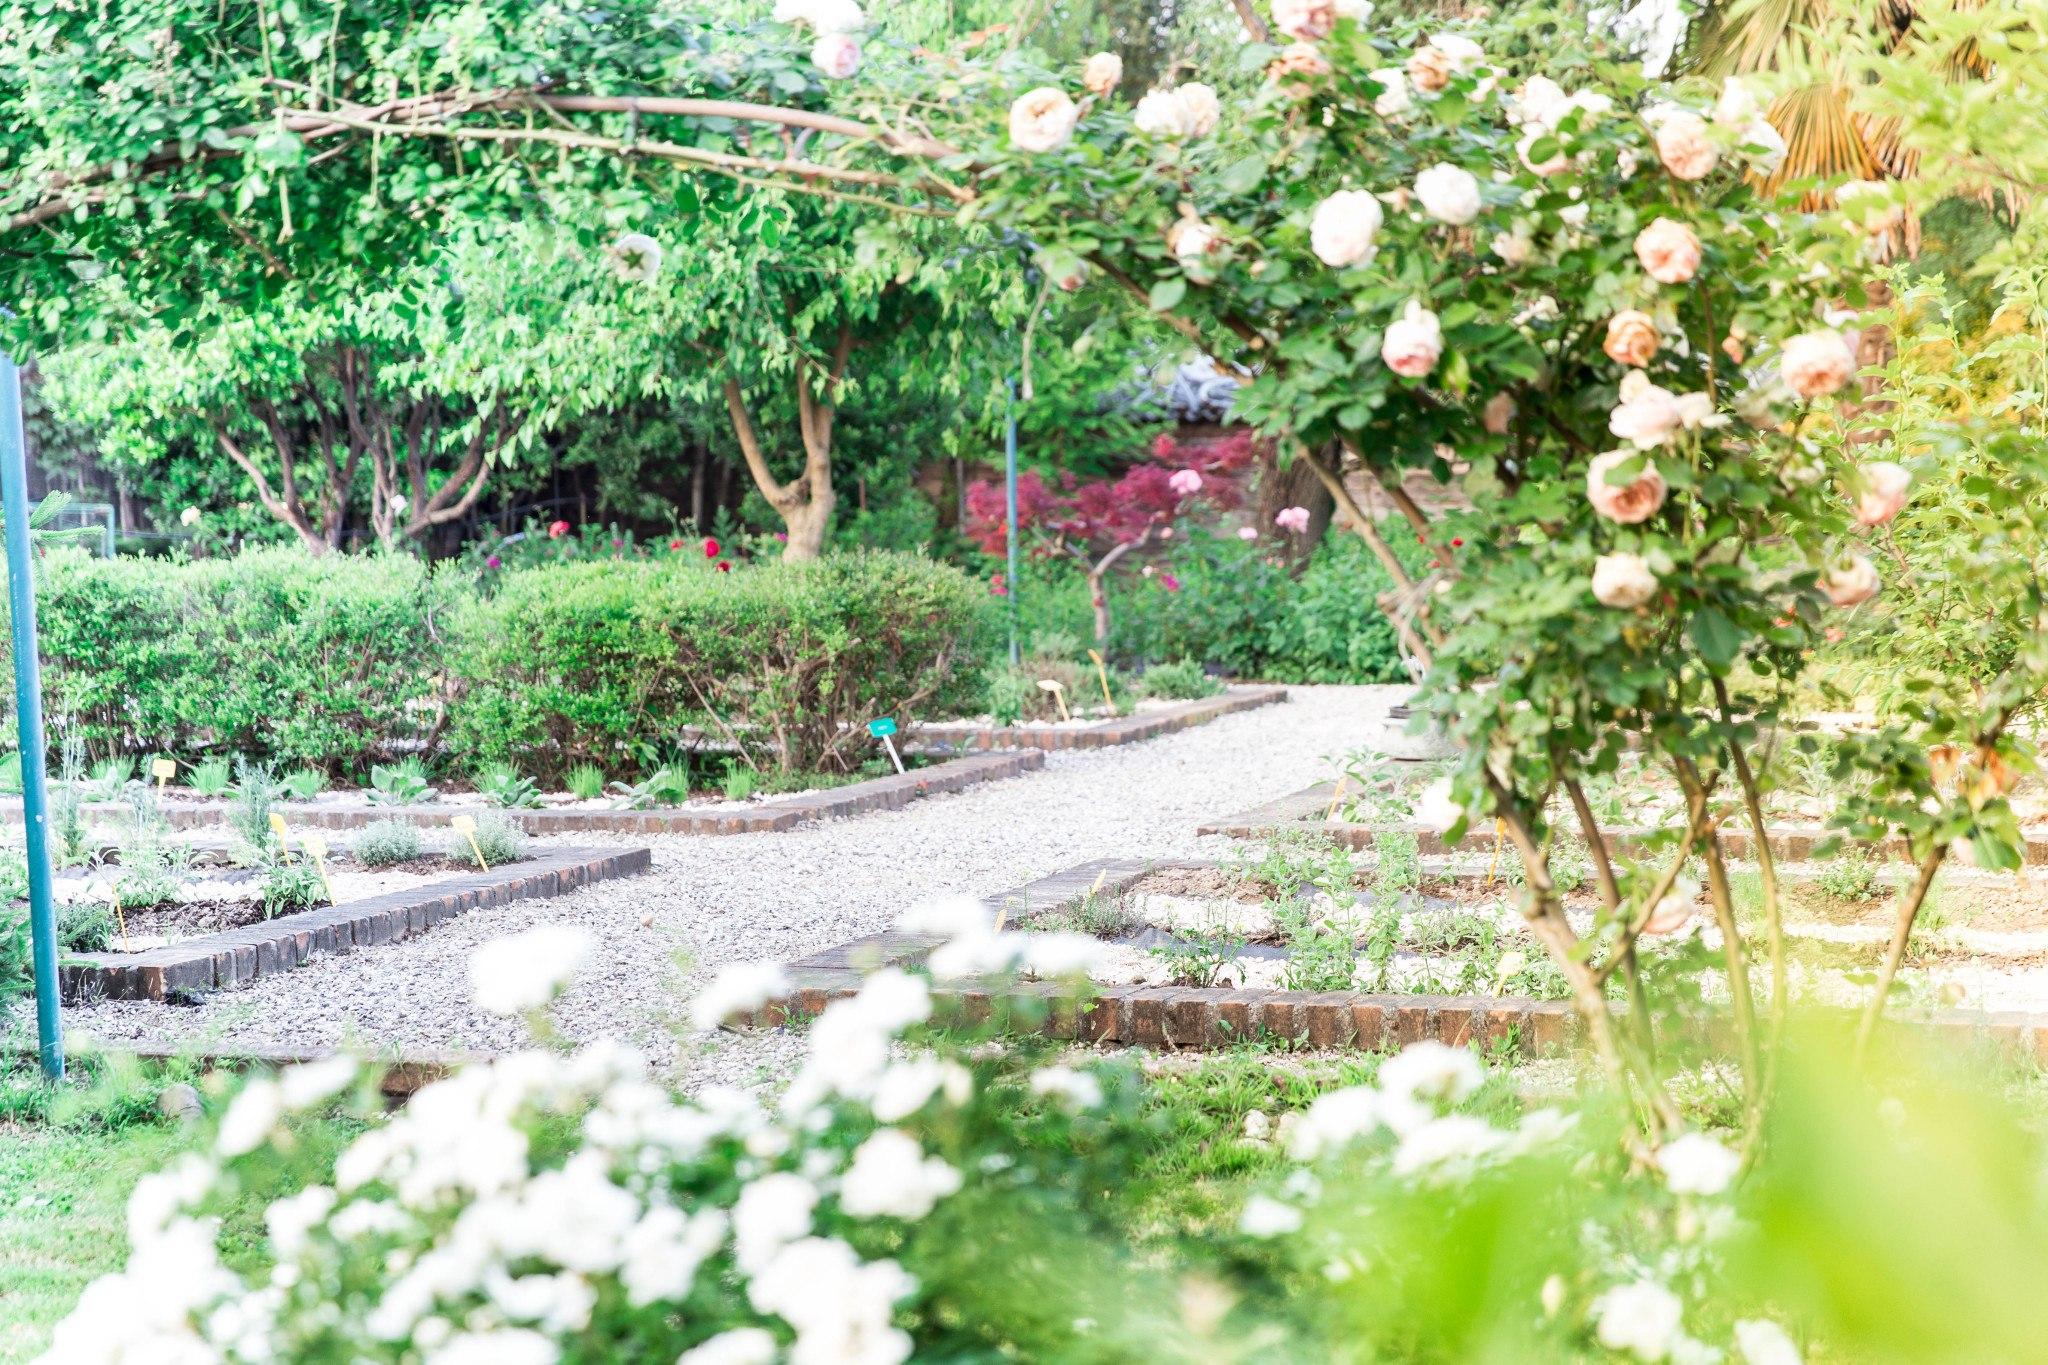 giardino_officinale55